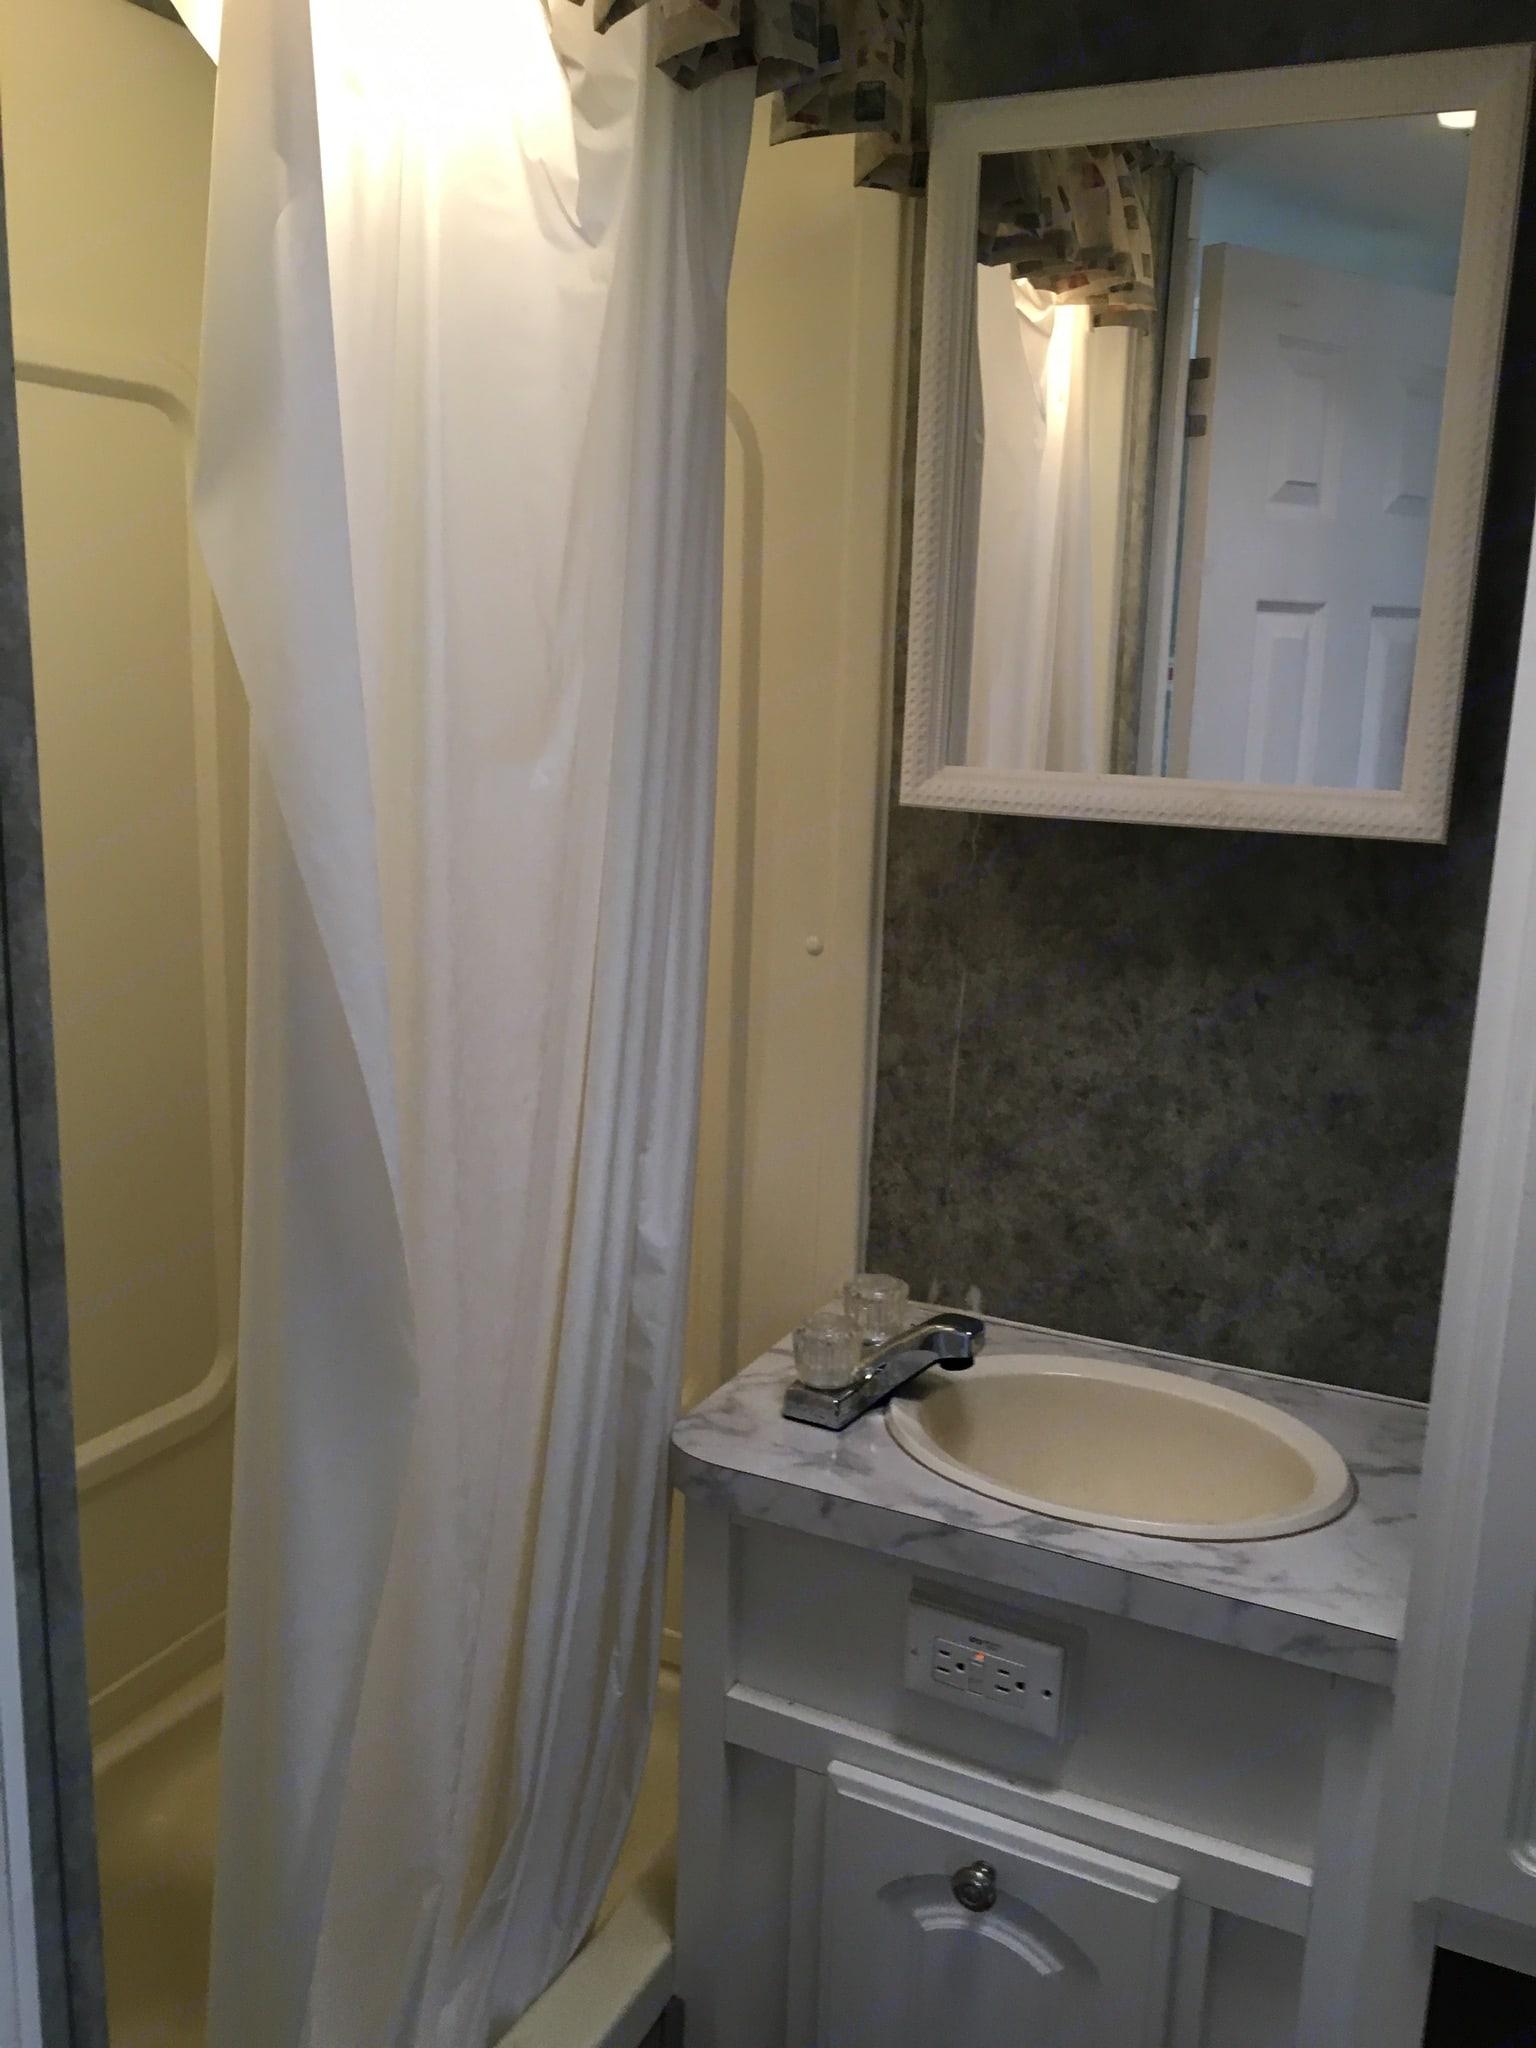 Bathroom. Starcraft Aruba 2007